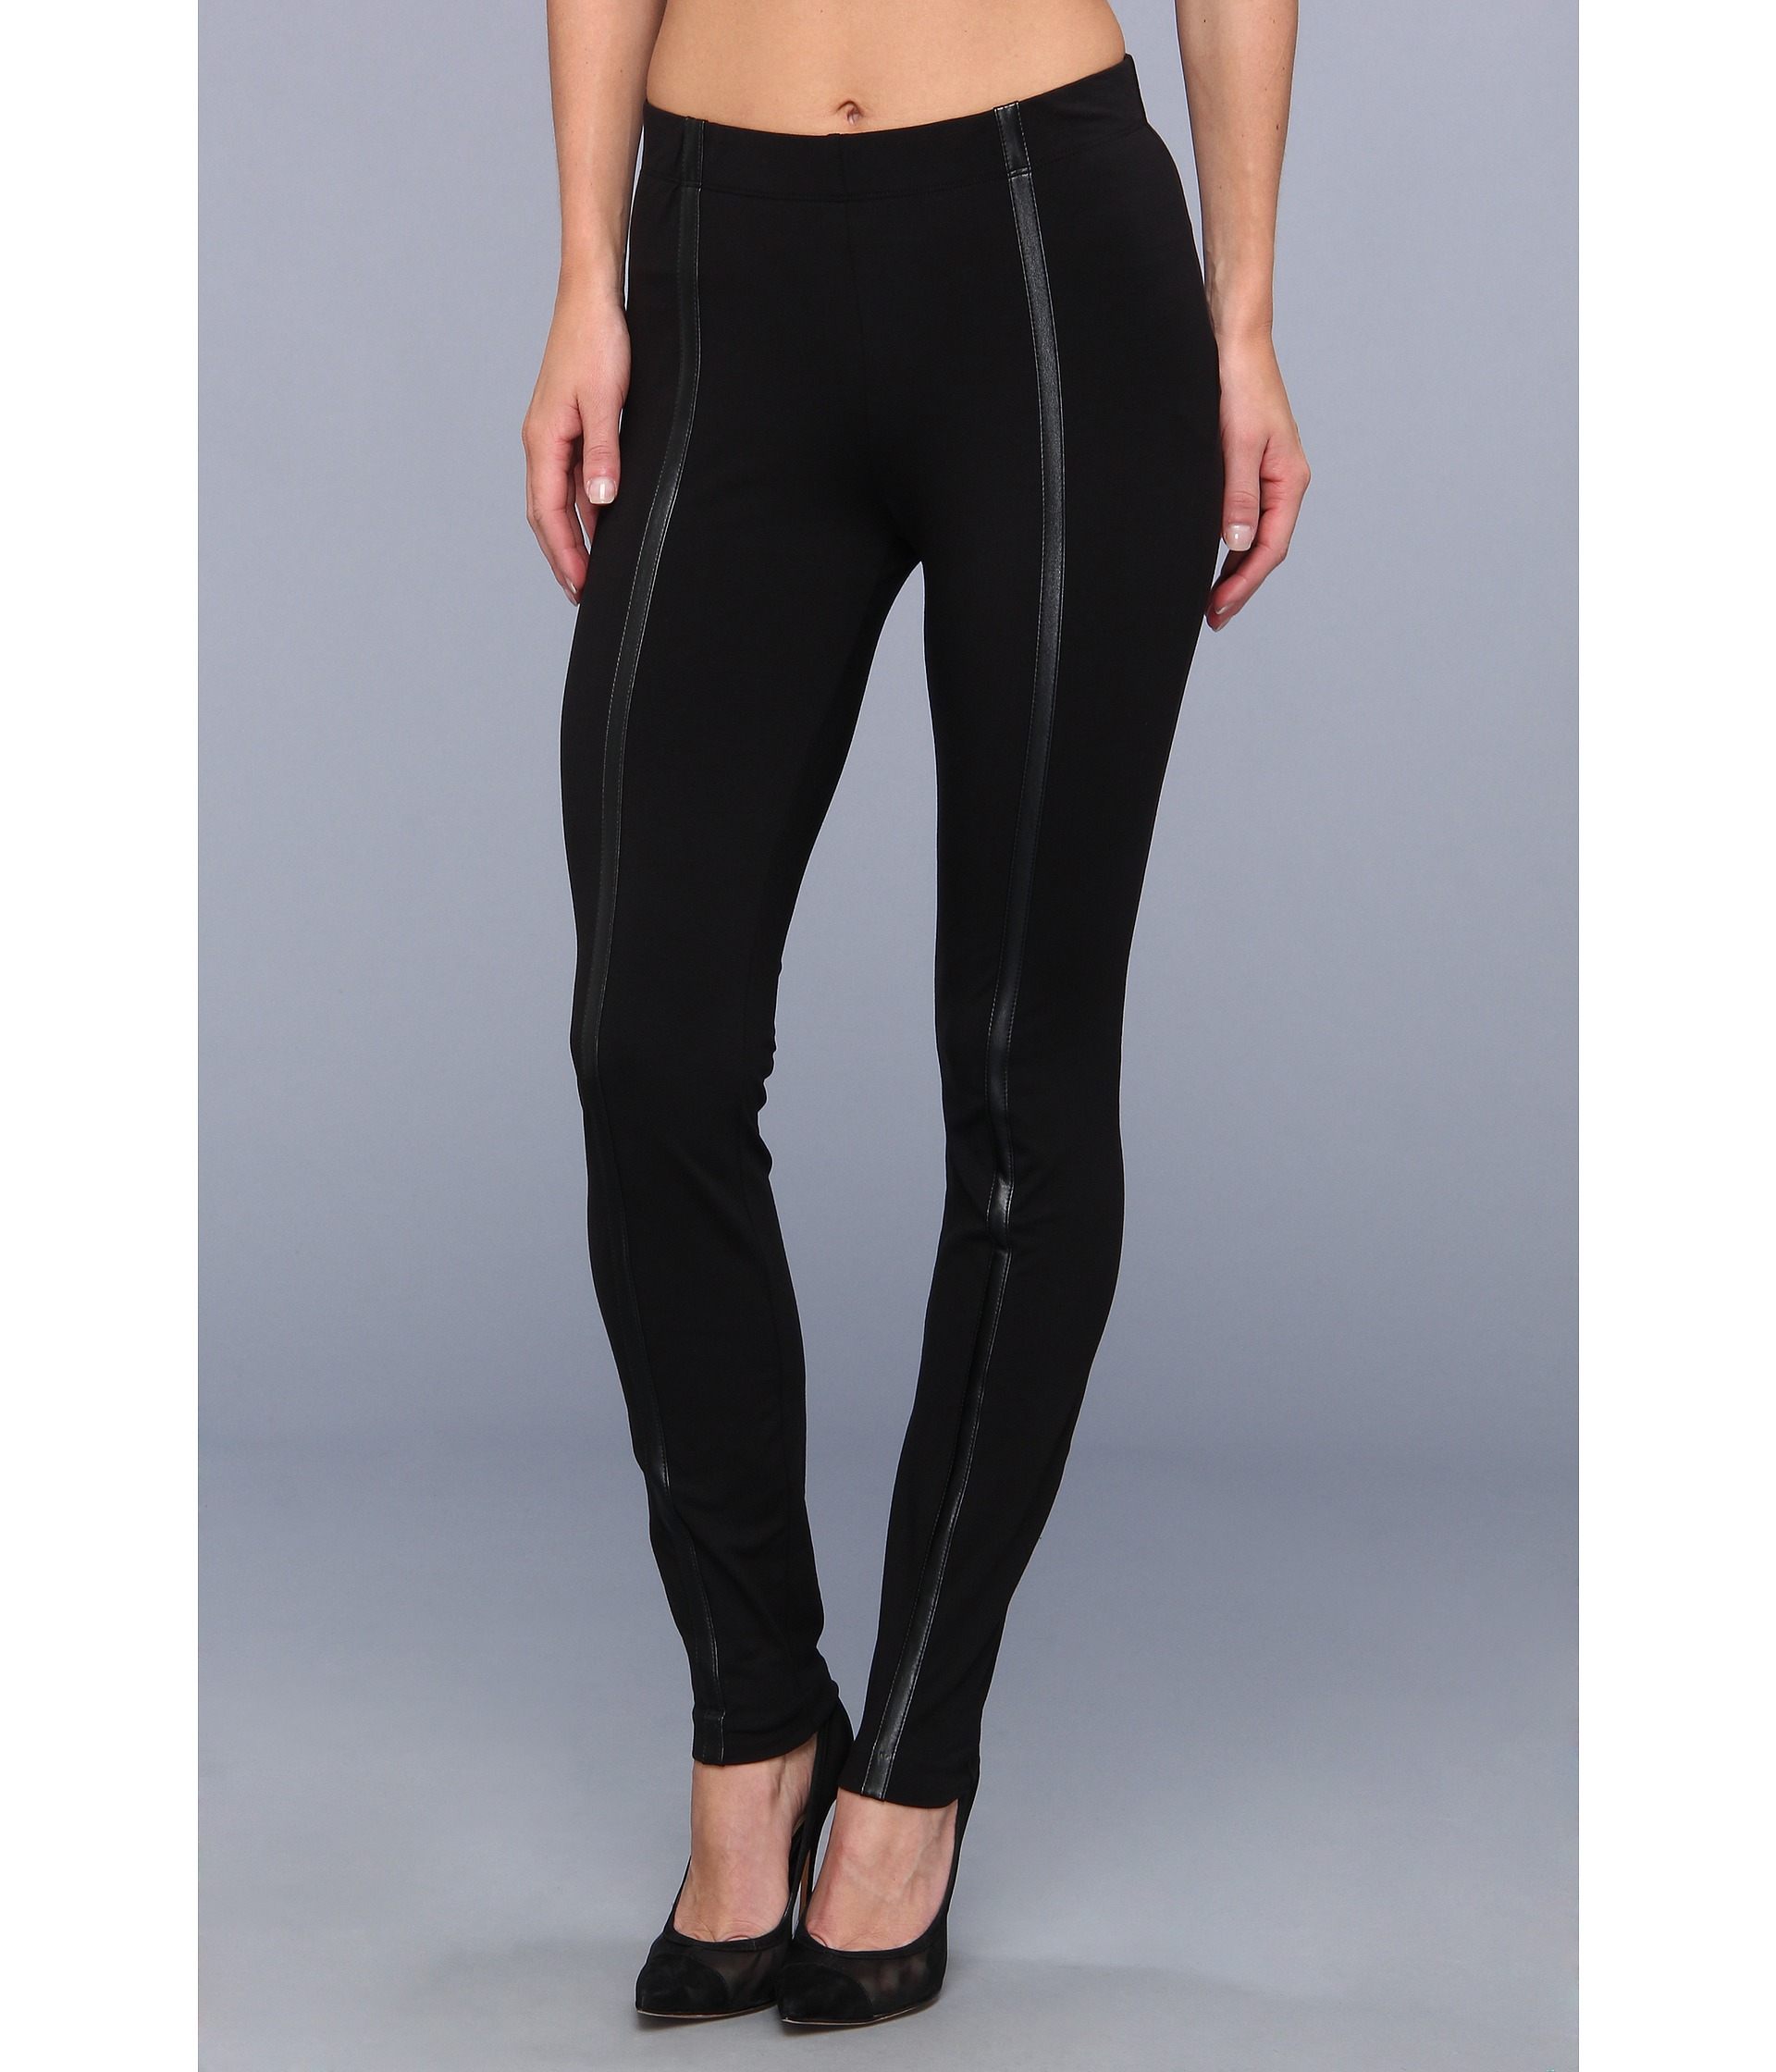 dknyc cotton spandex faux leather strip legging shipped